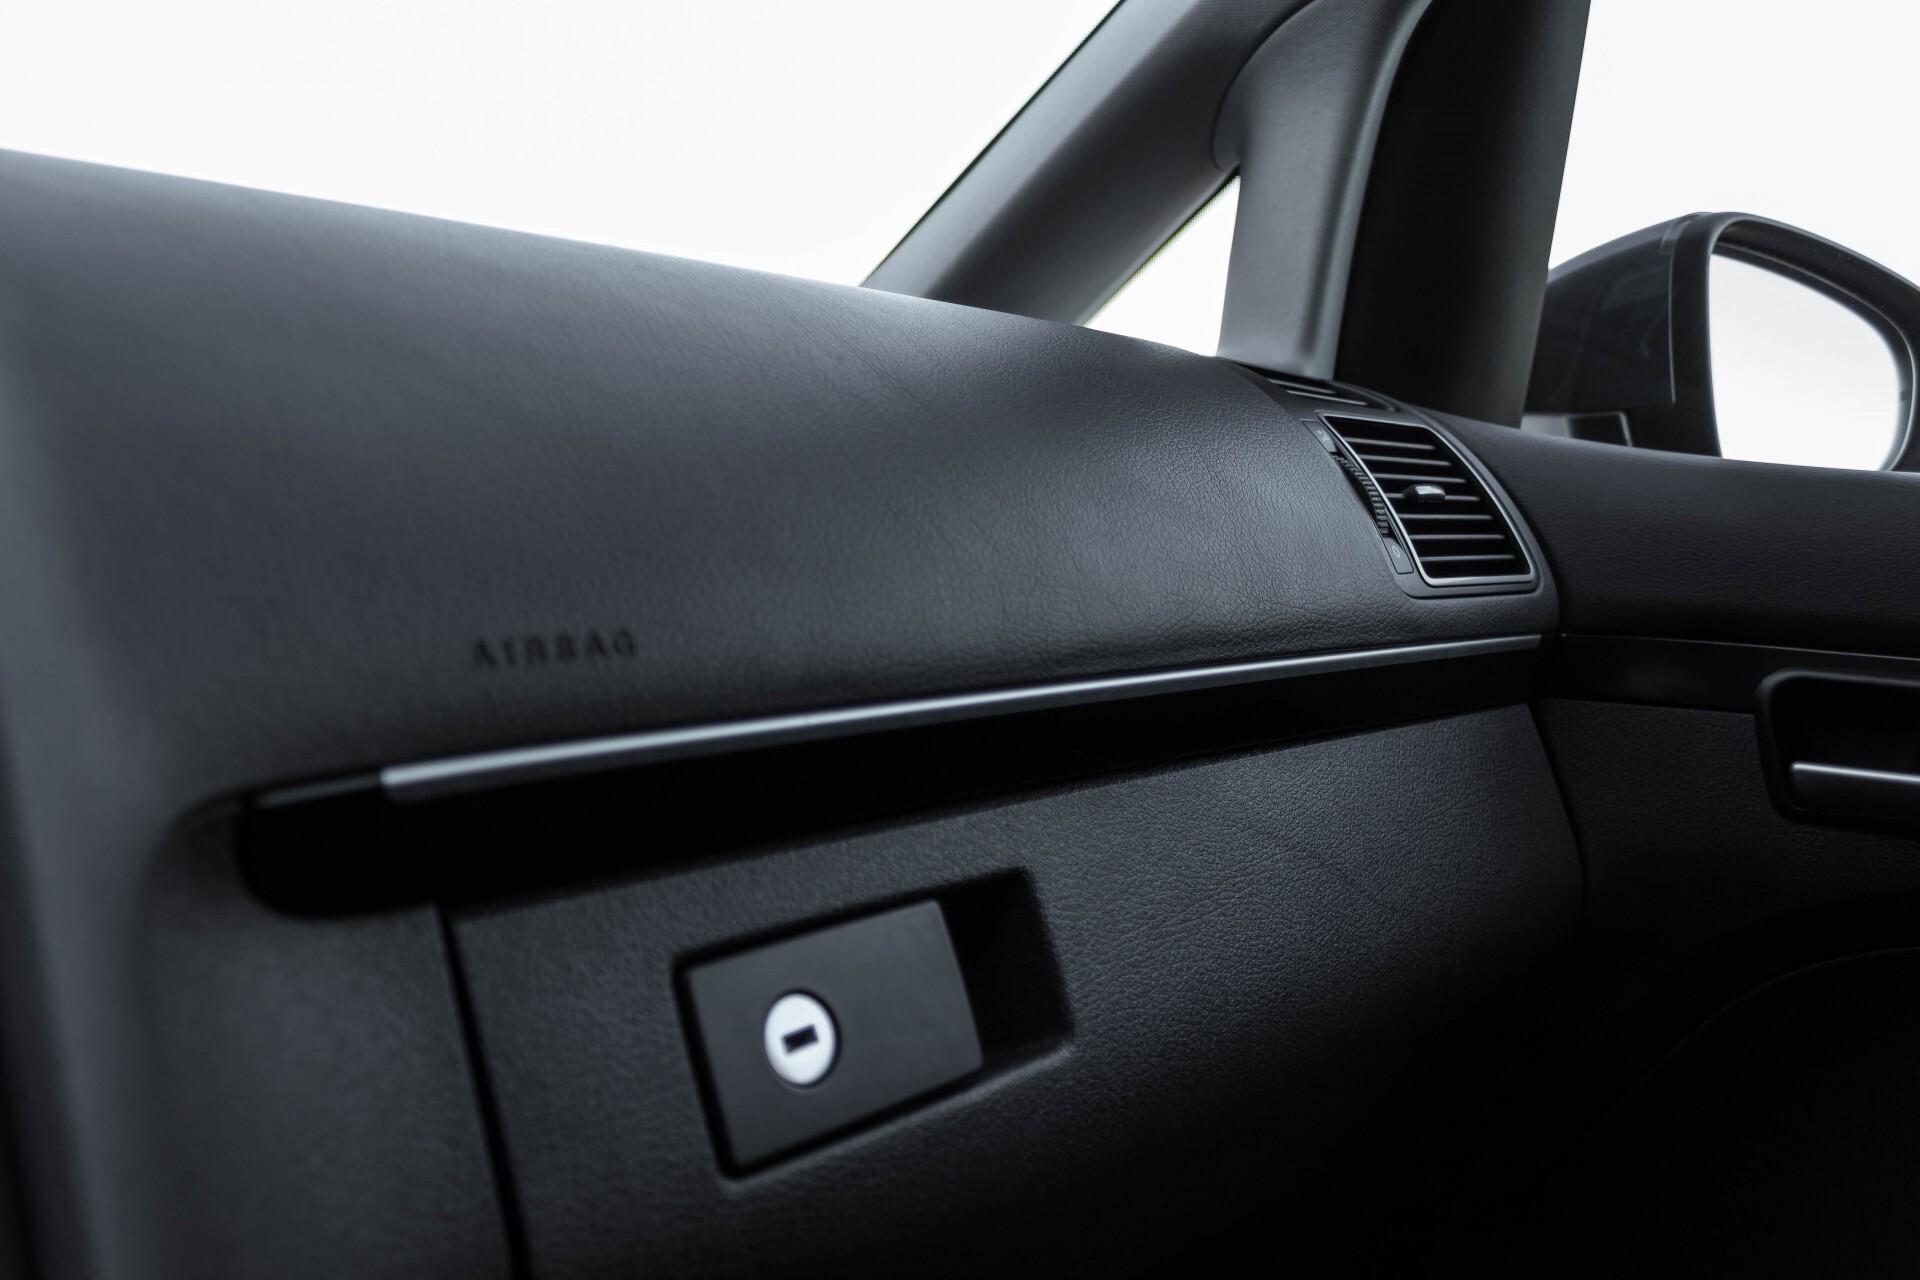 Volkswagen Touran 2.0 TDI Highline 7Persoons 177pk Panorama/Leder/Navi/Camera/Verw-Stln/Trhk/ECC/Xenon Aut Foto 28